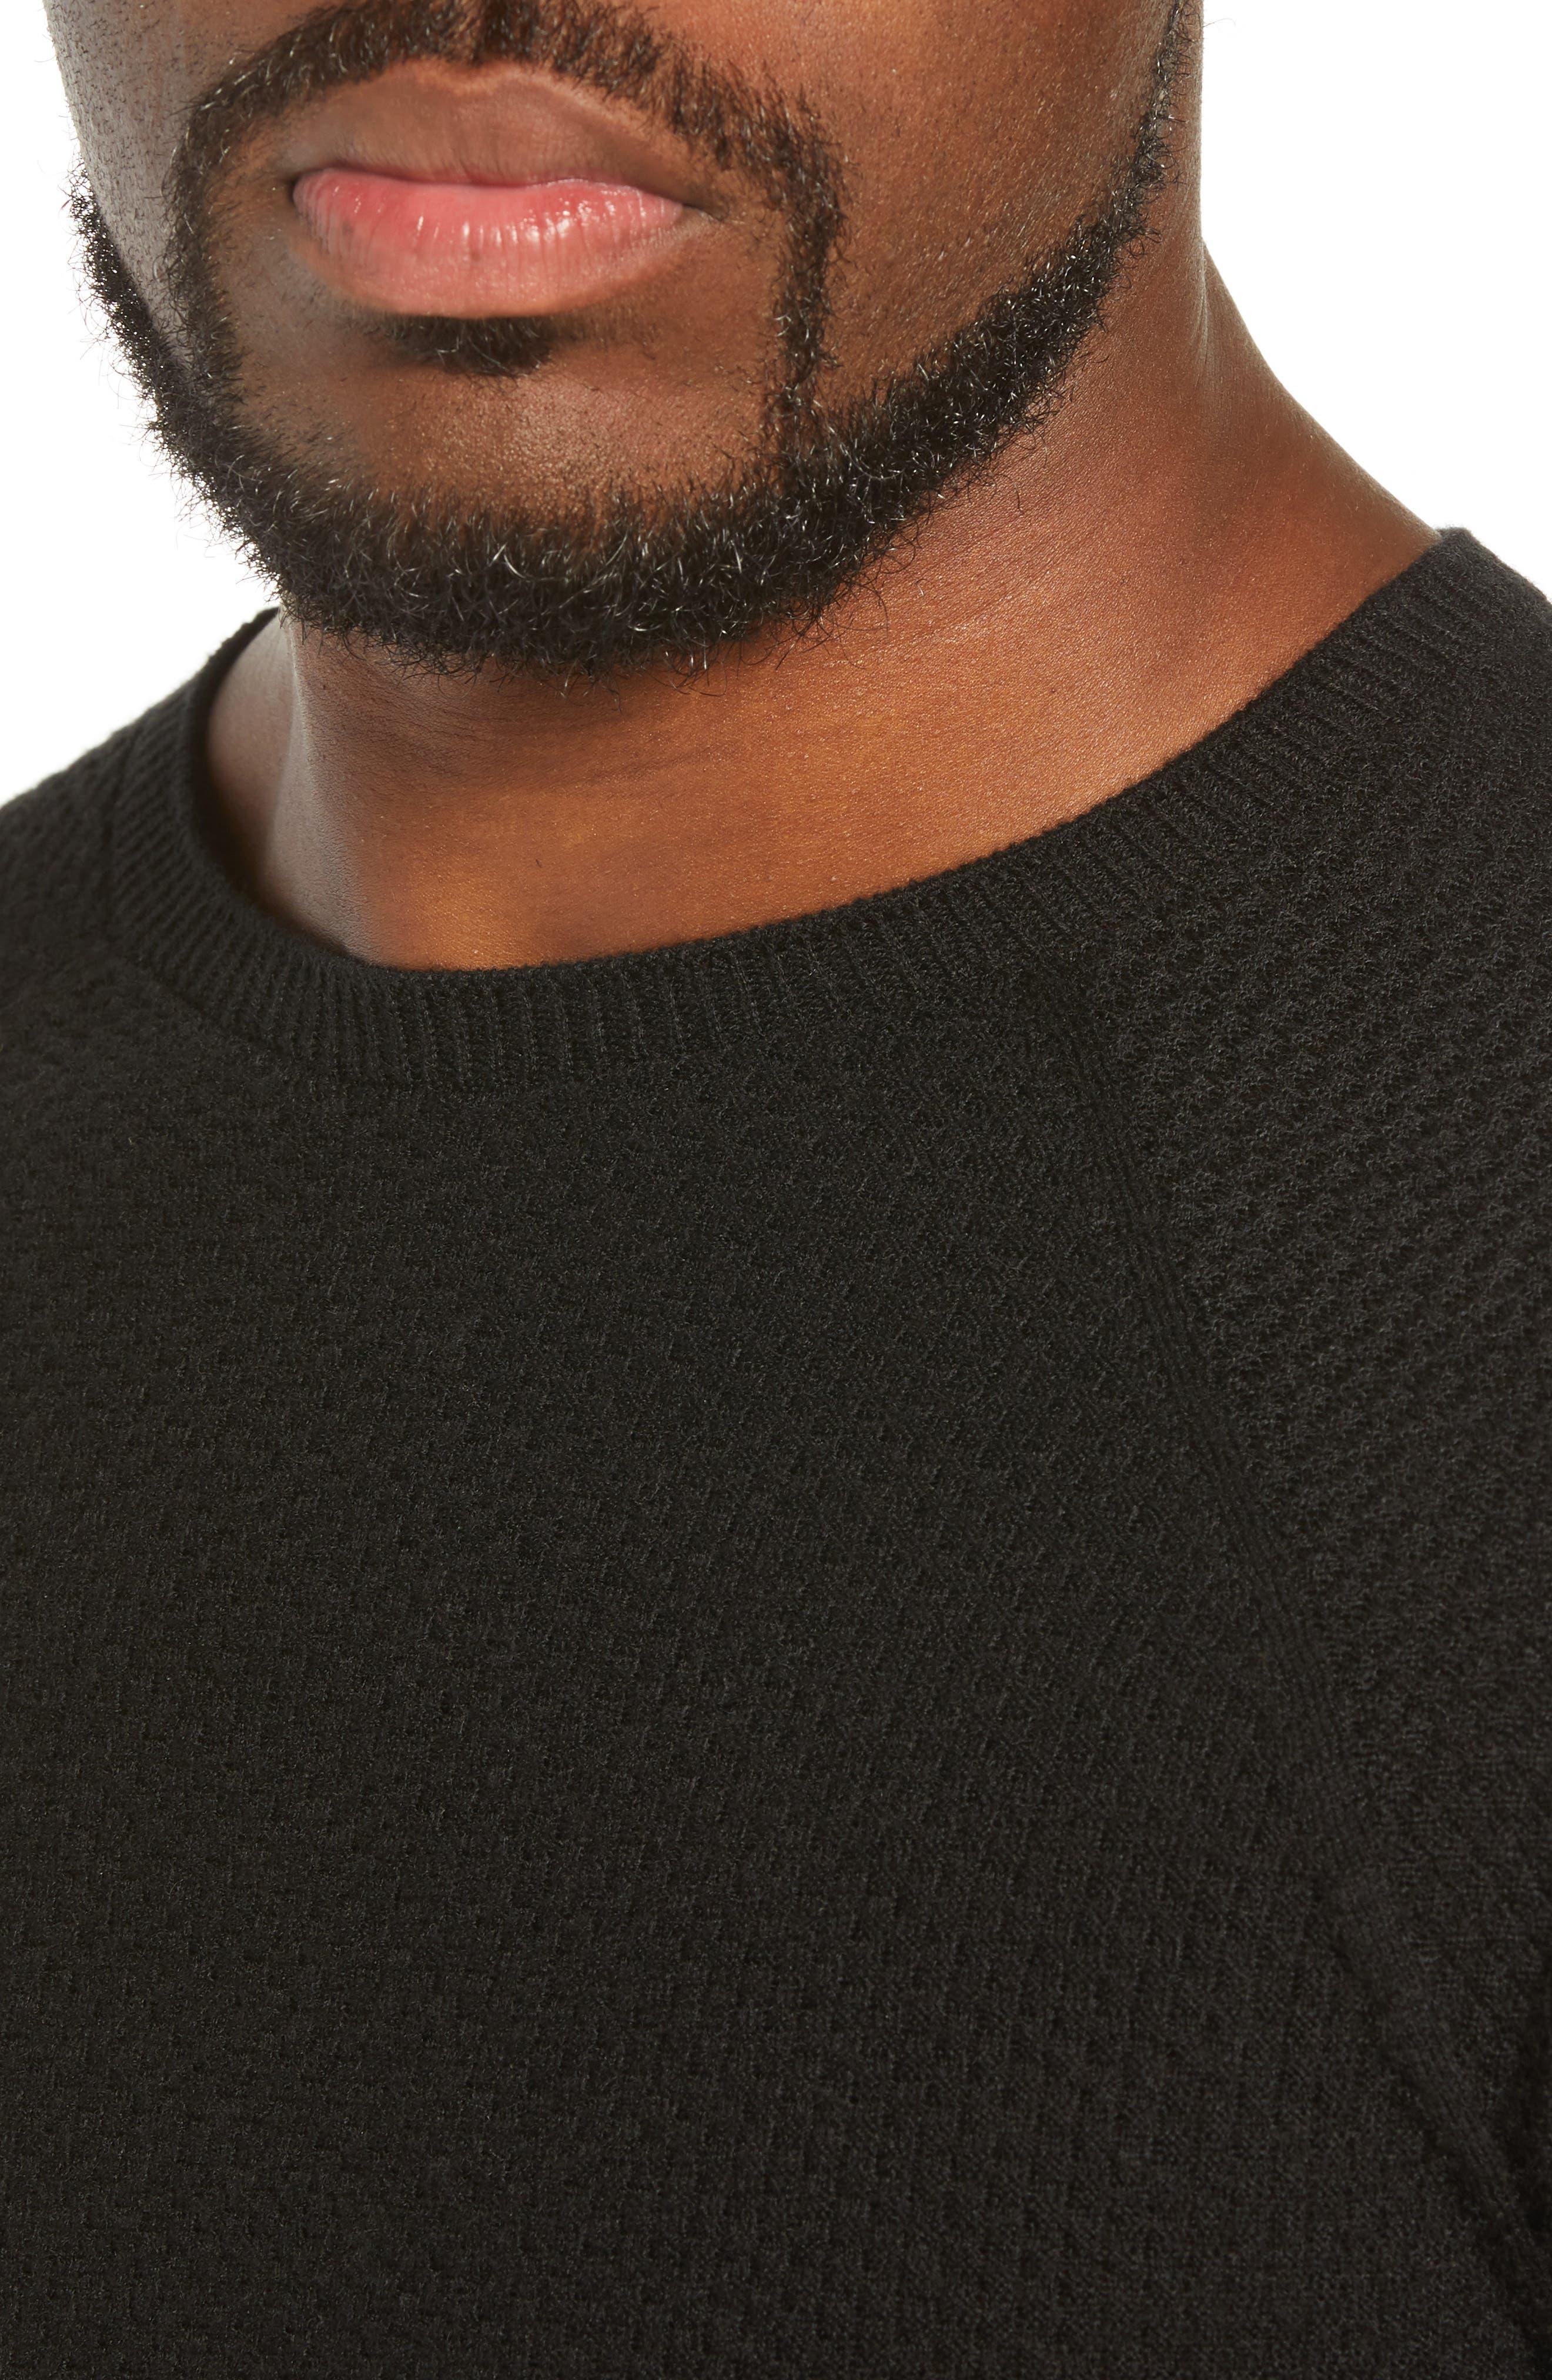 Capilene<sup>®</sup> Lightweight Air Crew Sweater,                             Alternate thumbnail 4, color,                             BLACK